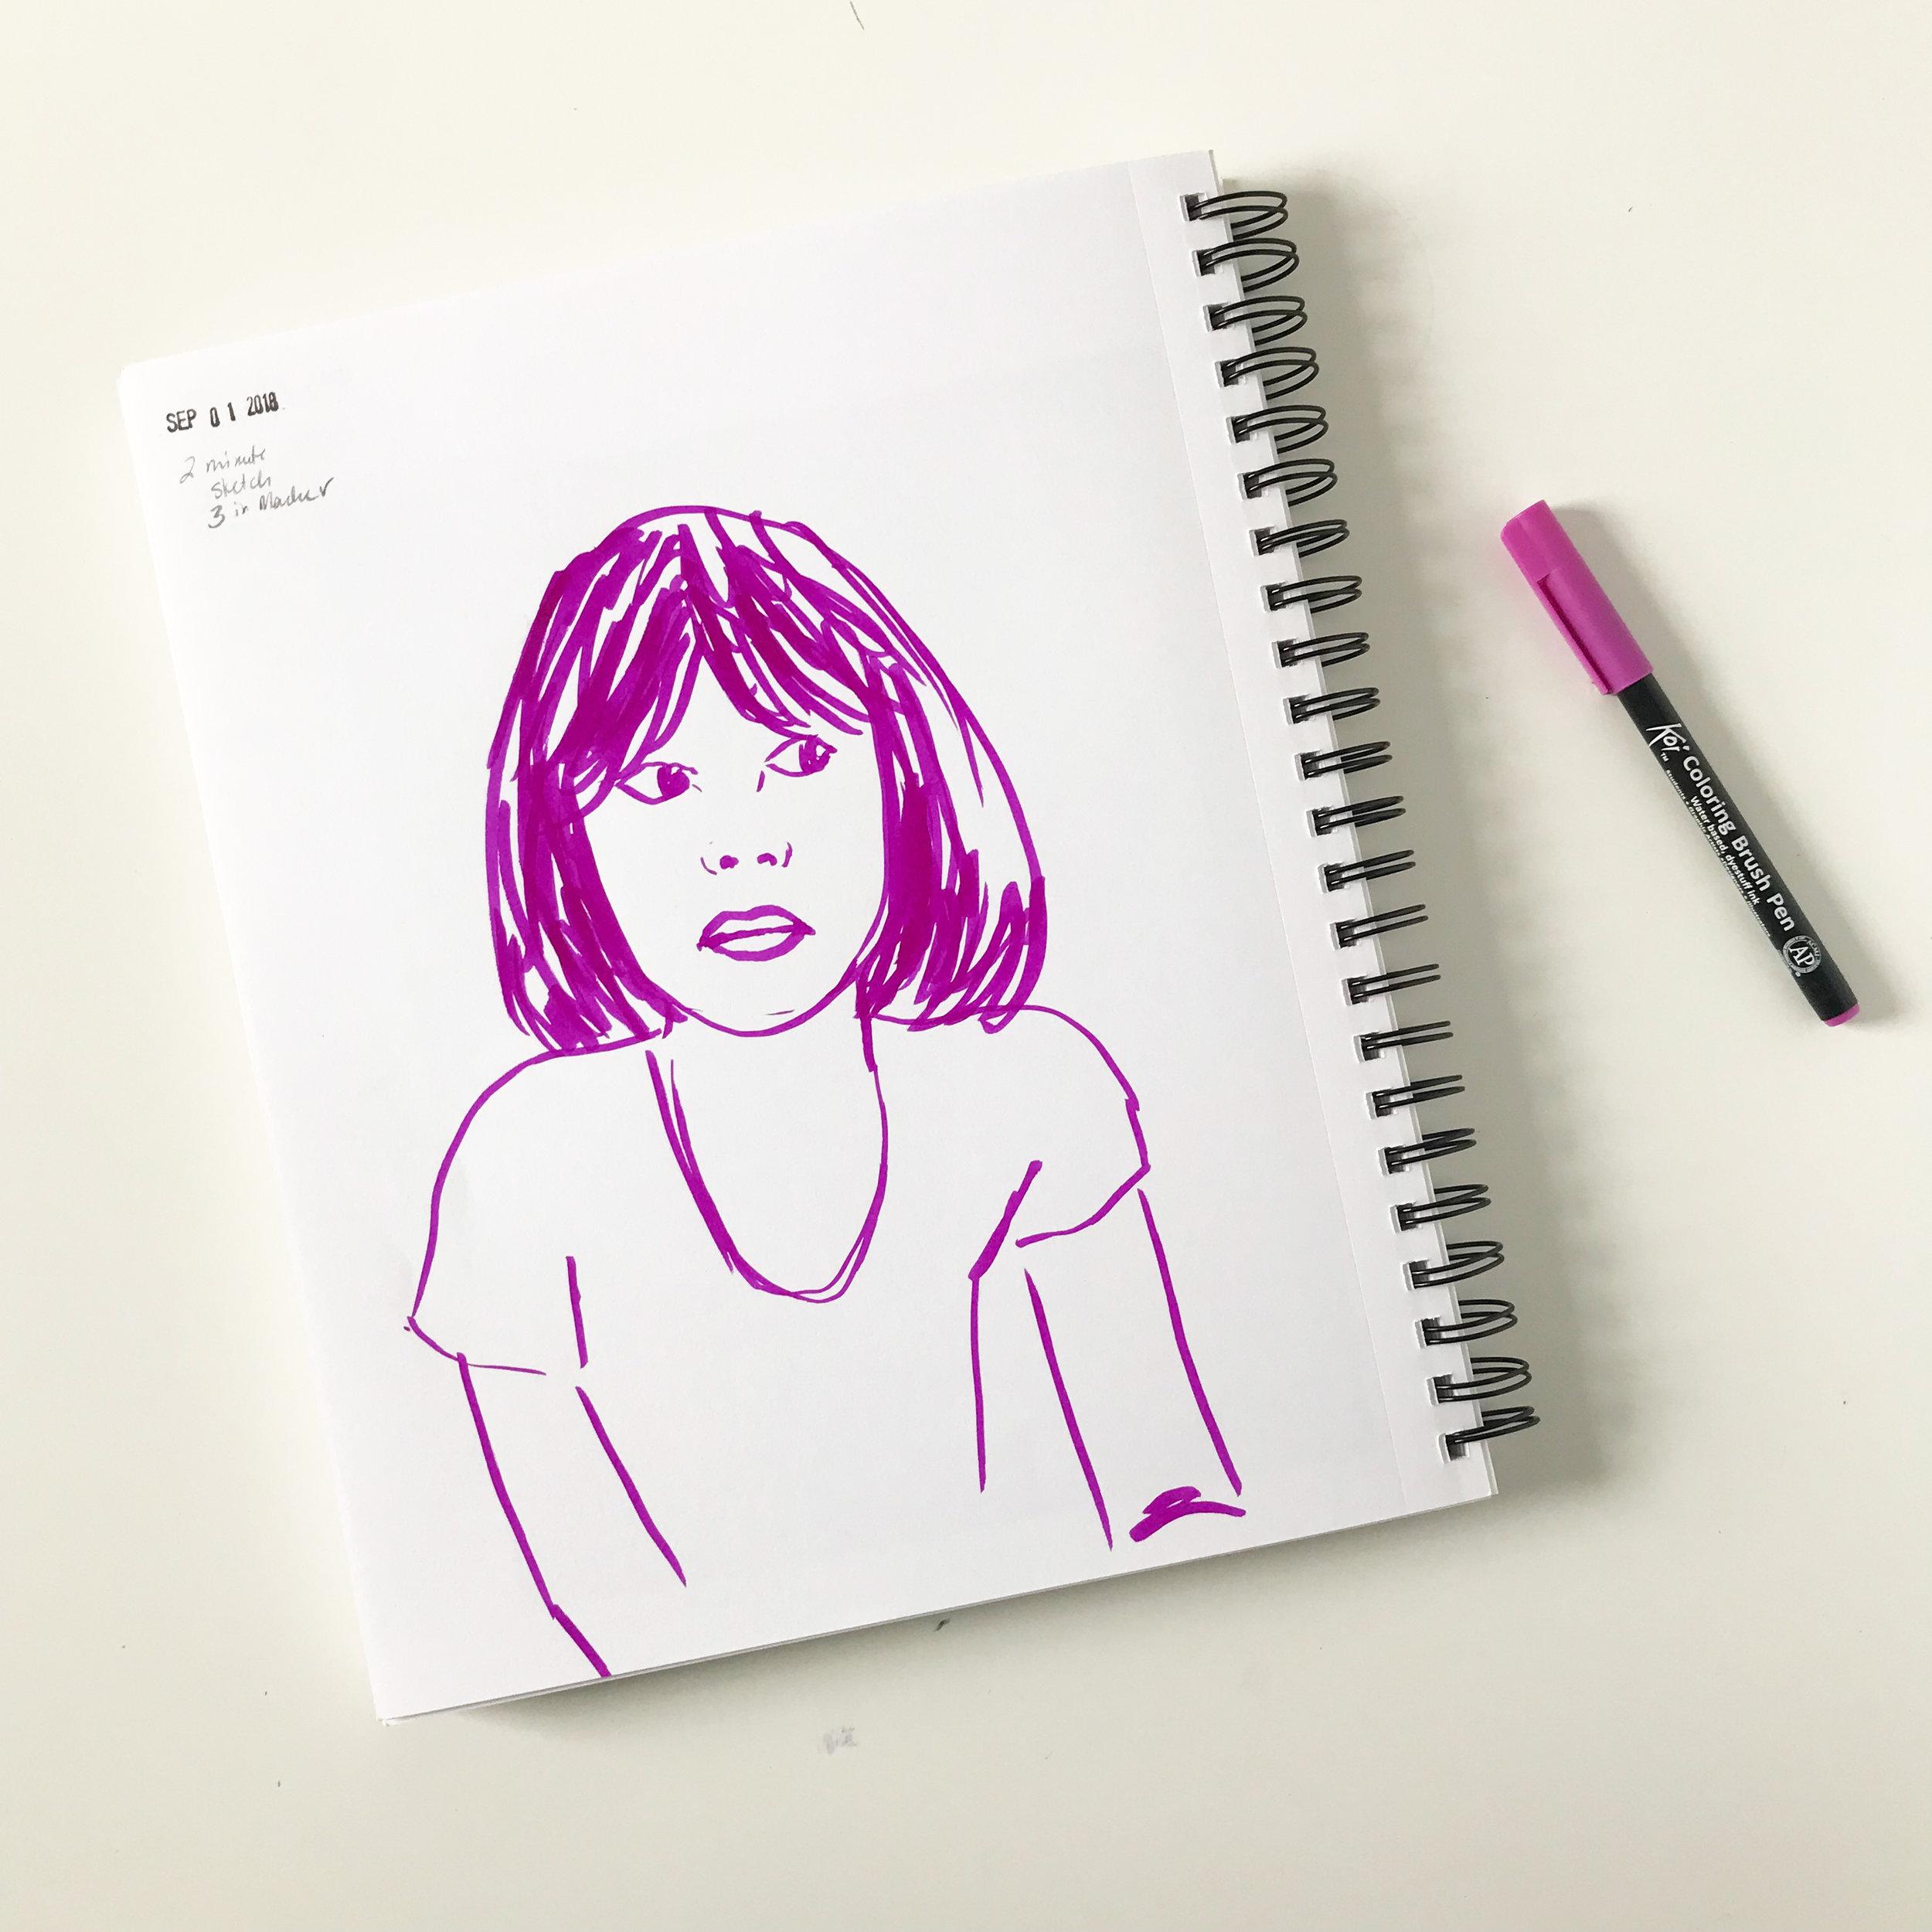 A 2 Minute Marker Sketch Portrait Created with Charlotte Hamilton's Creativebug Class